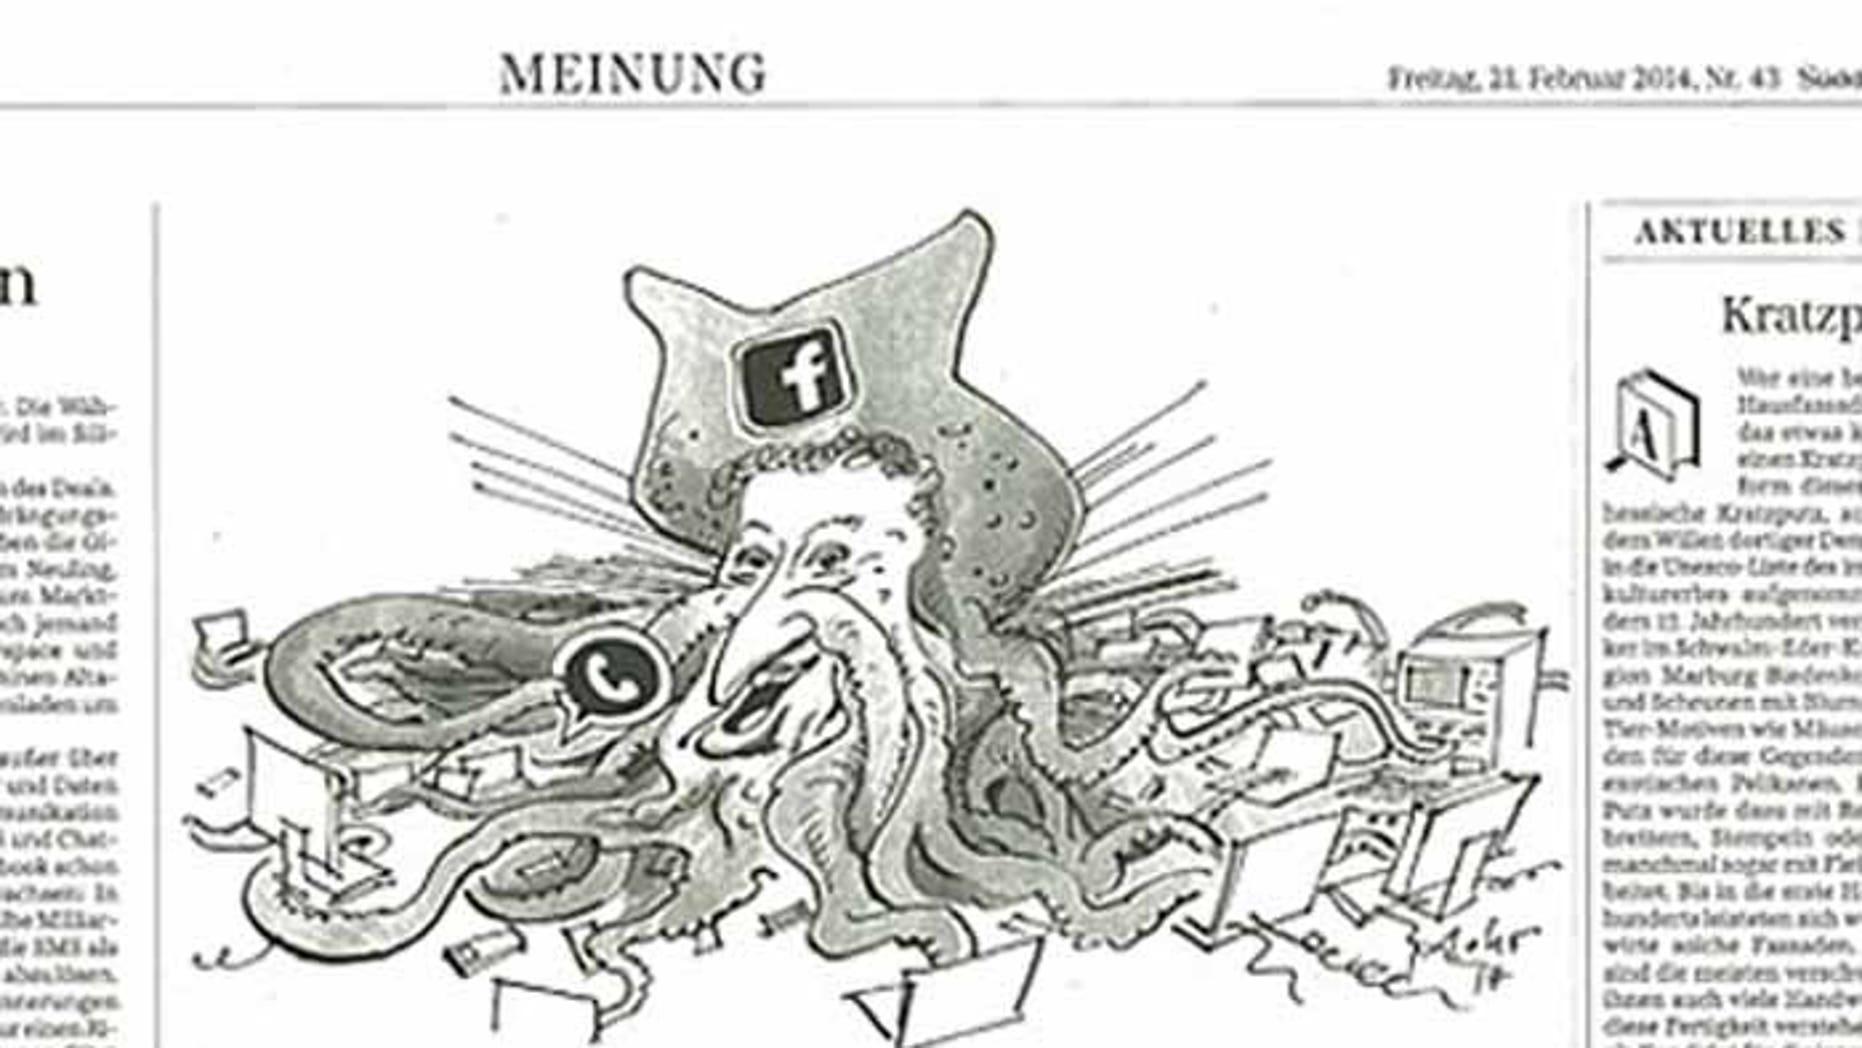 This cartoon, in the German newspaper Süddeutsche Zeitung, depicts Facebook founder Mark Zuckerberg in a manner deemed anti-semitic by critics.